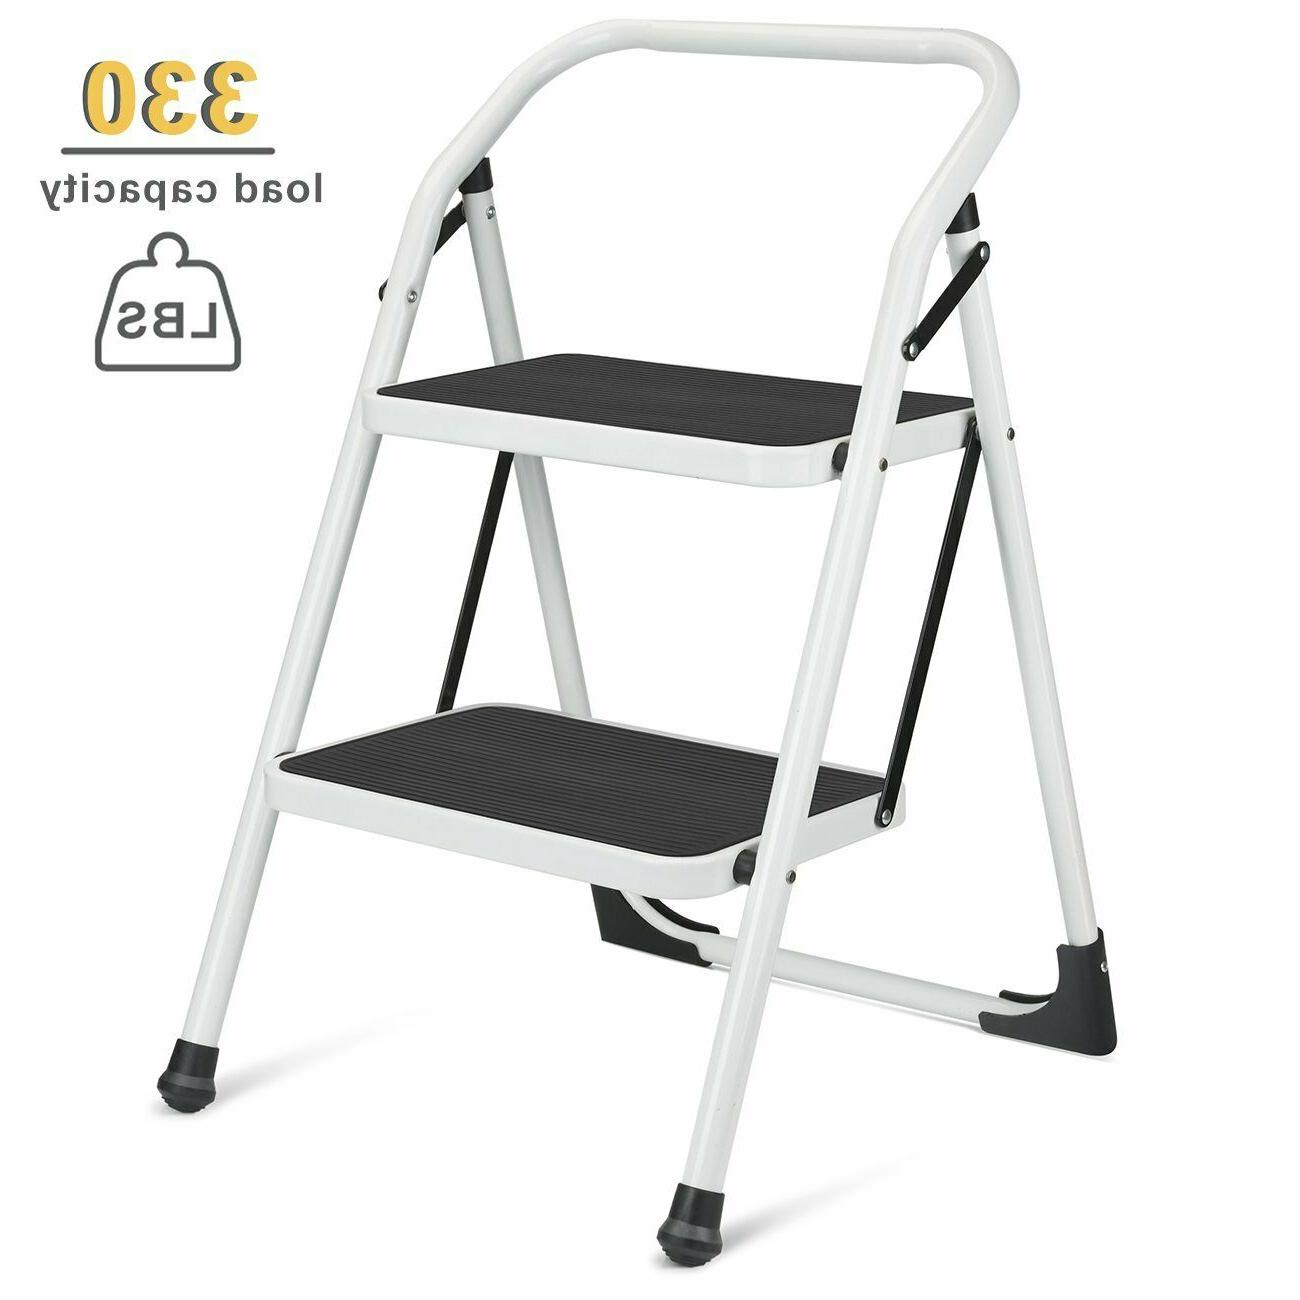 Delxo 2 Step Ladder Portable Step Stool Handgrip Anti-Slip W